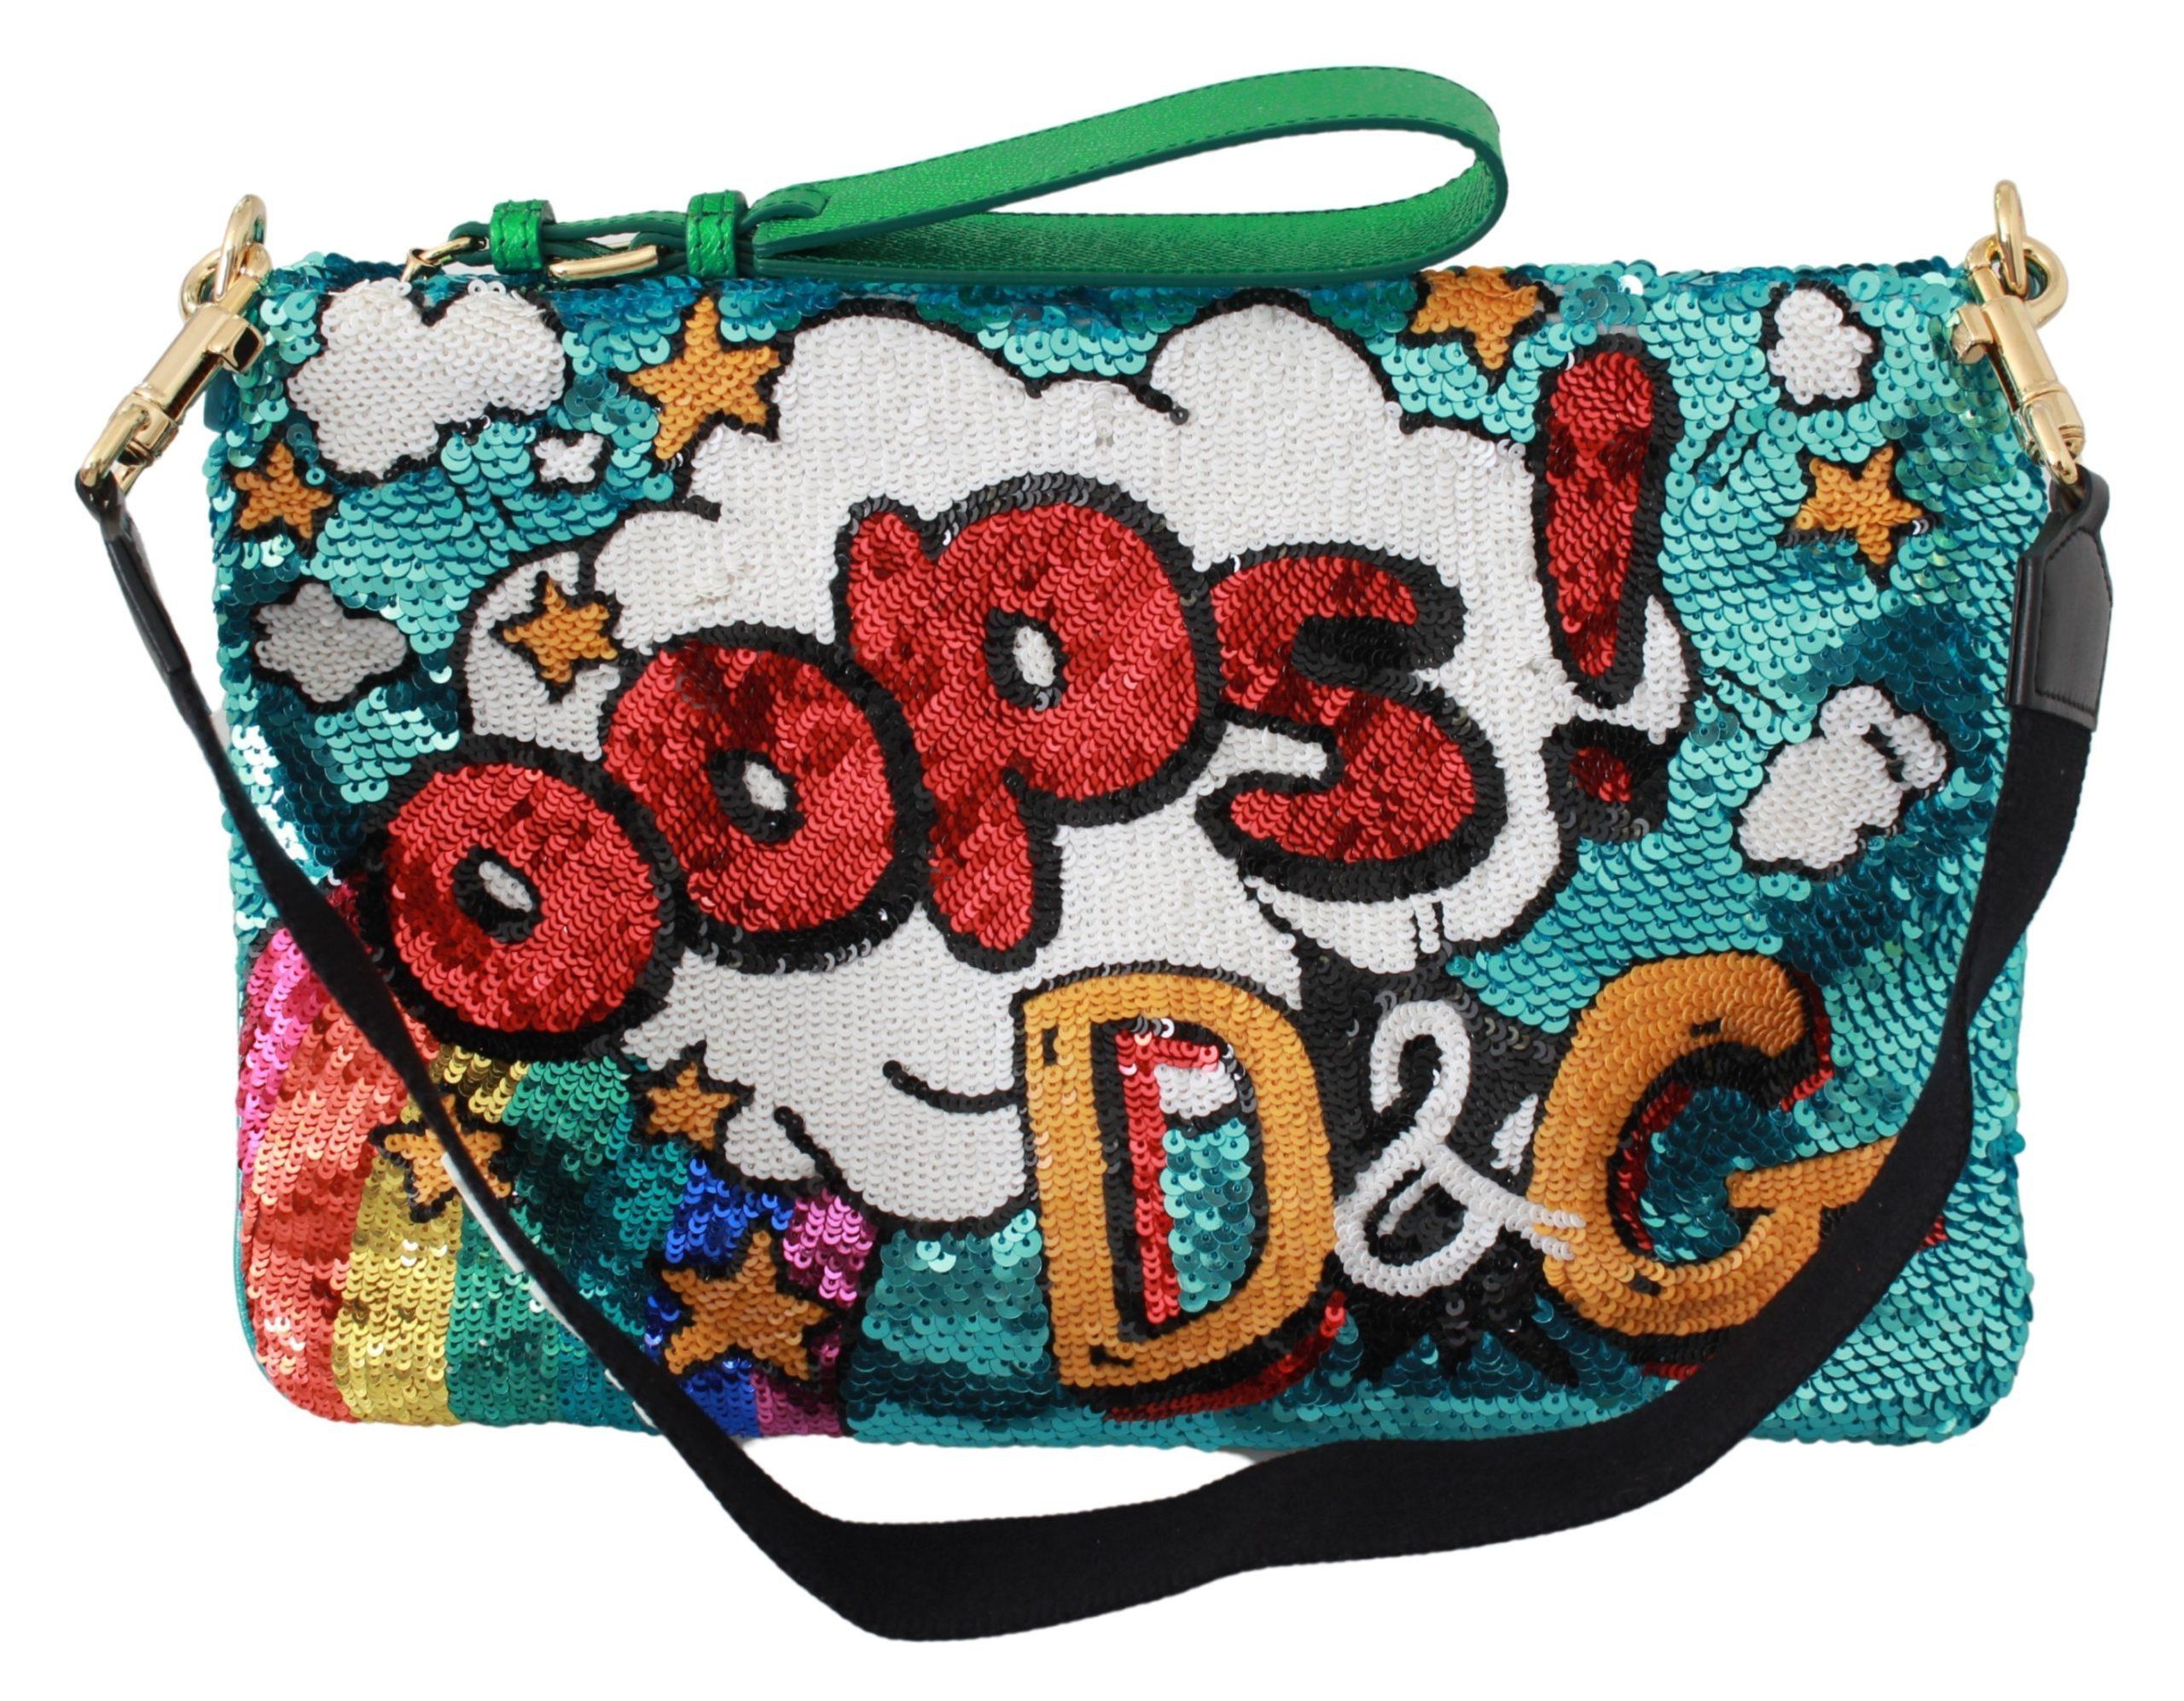 Dolce & Gabbana Women's Cartoon Sequined Clutch Bag Multicolor VAS9445